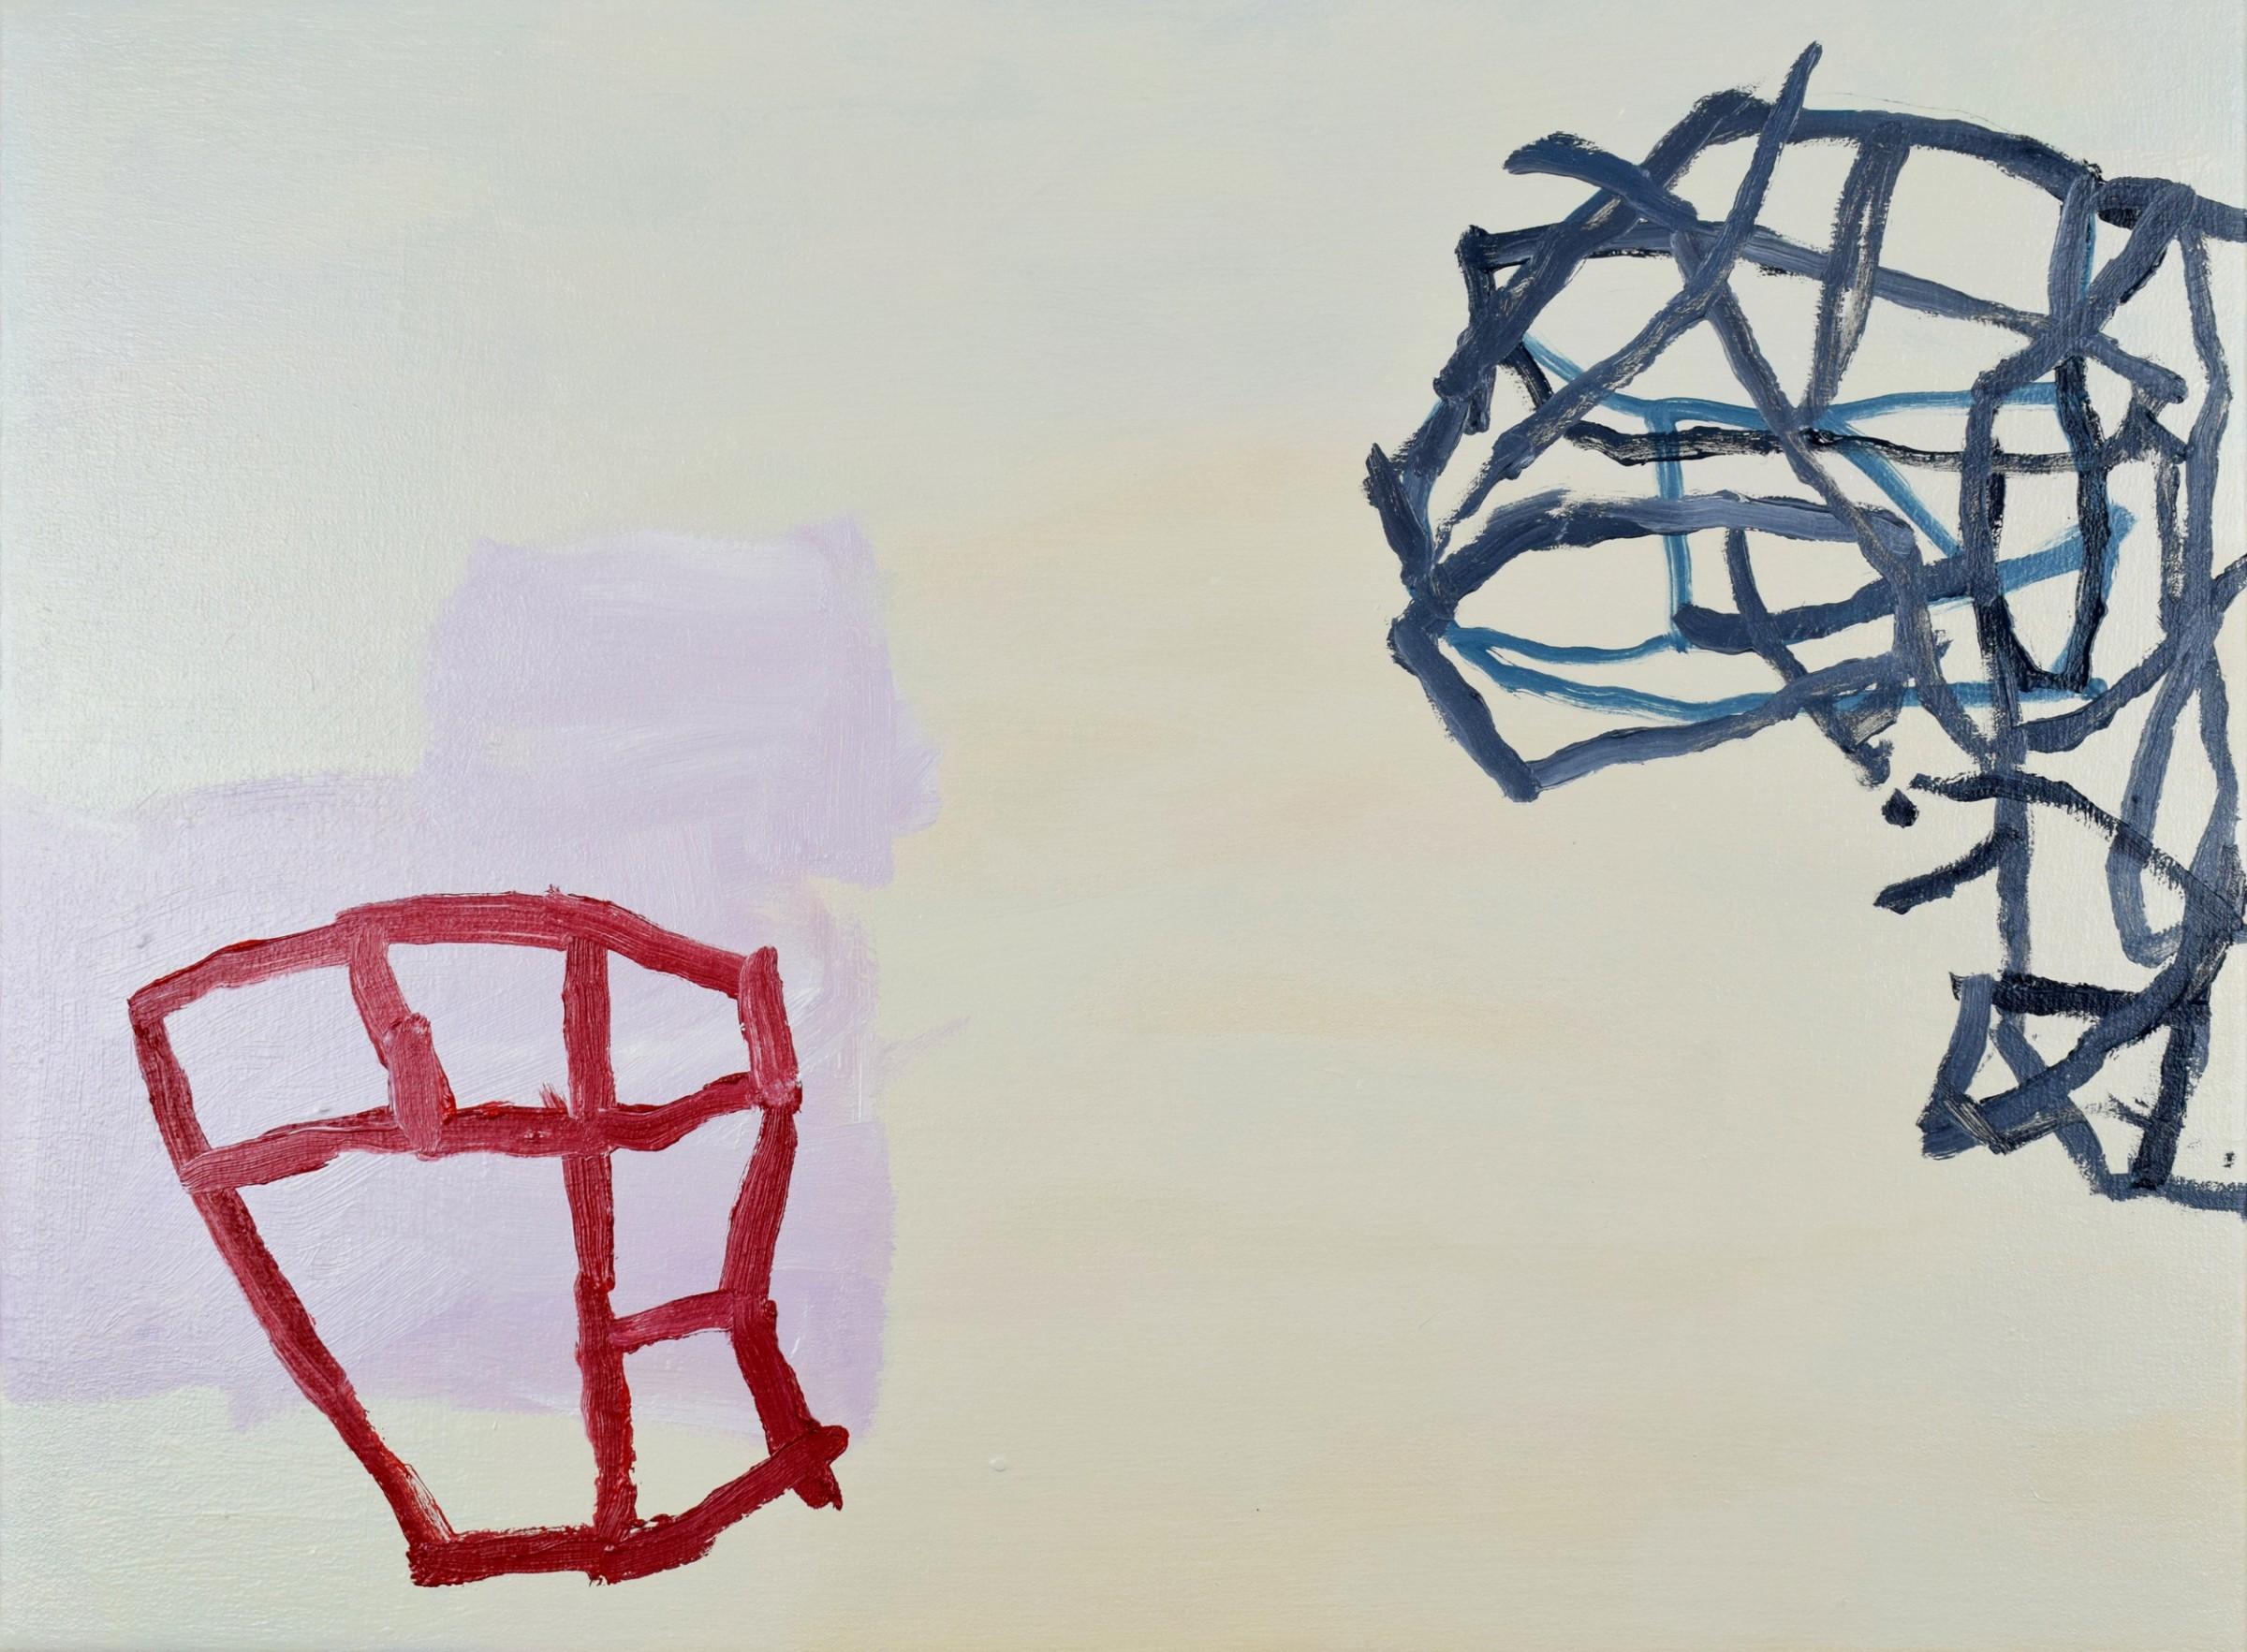 "<span class=""link fancybox-details-link""><a href=""/artists/75-michelle-griffiths-vpre/works/11091/"">View Detail Page</a></span><div class=""artist""><span class=""artist""><strong>Michelle Griffiths VPRE</strong></span></div><div class=""title""><em>Underlying Reason</em></div><div class=""medium"">oil on canvas</div><div class=""dimensions"">50.5 x 65.5 cm framed<br /> 46 x 61 cm image size</div><div class=""price"">£1250.00</div>"